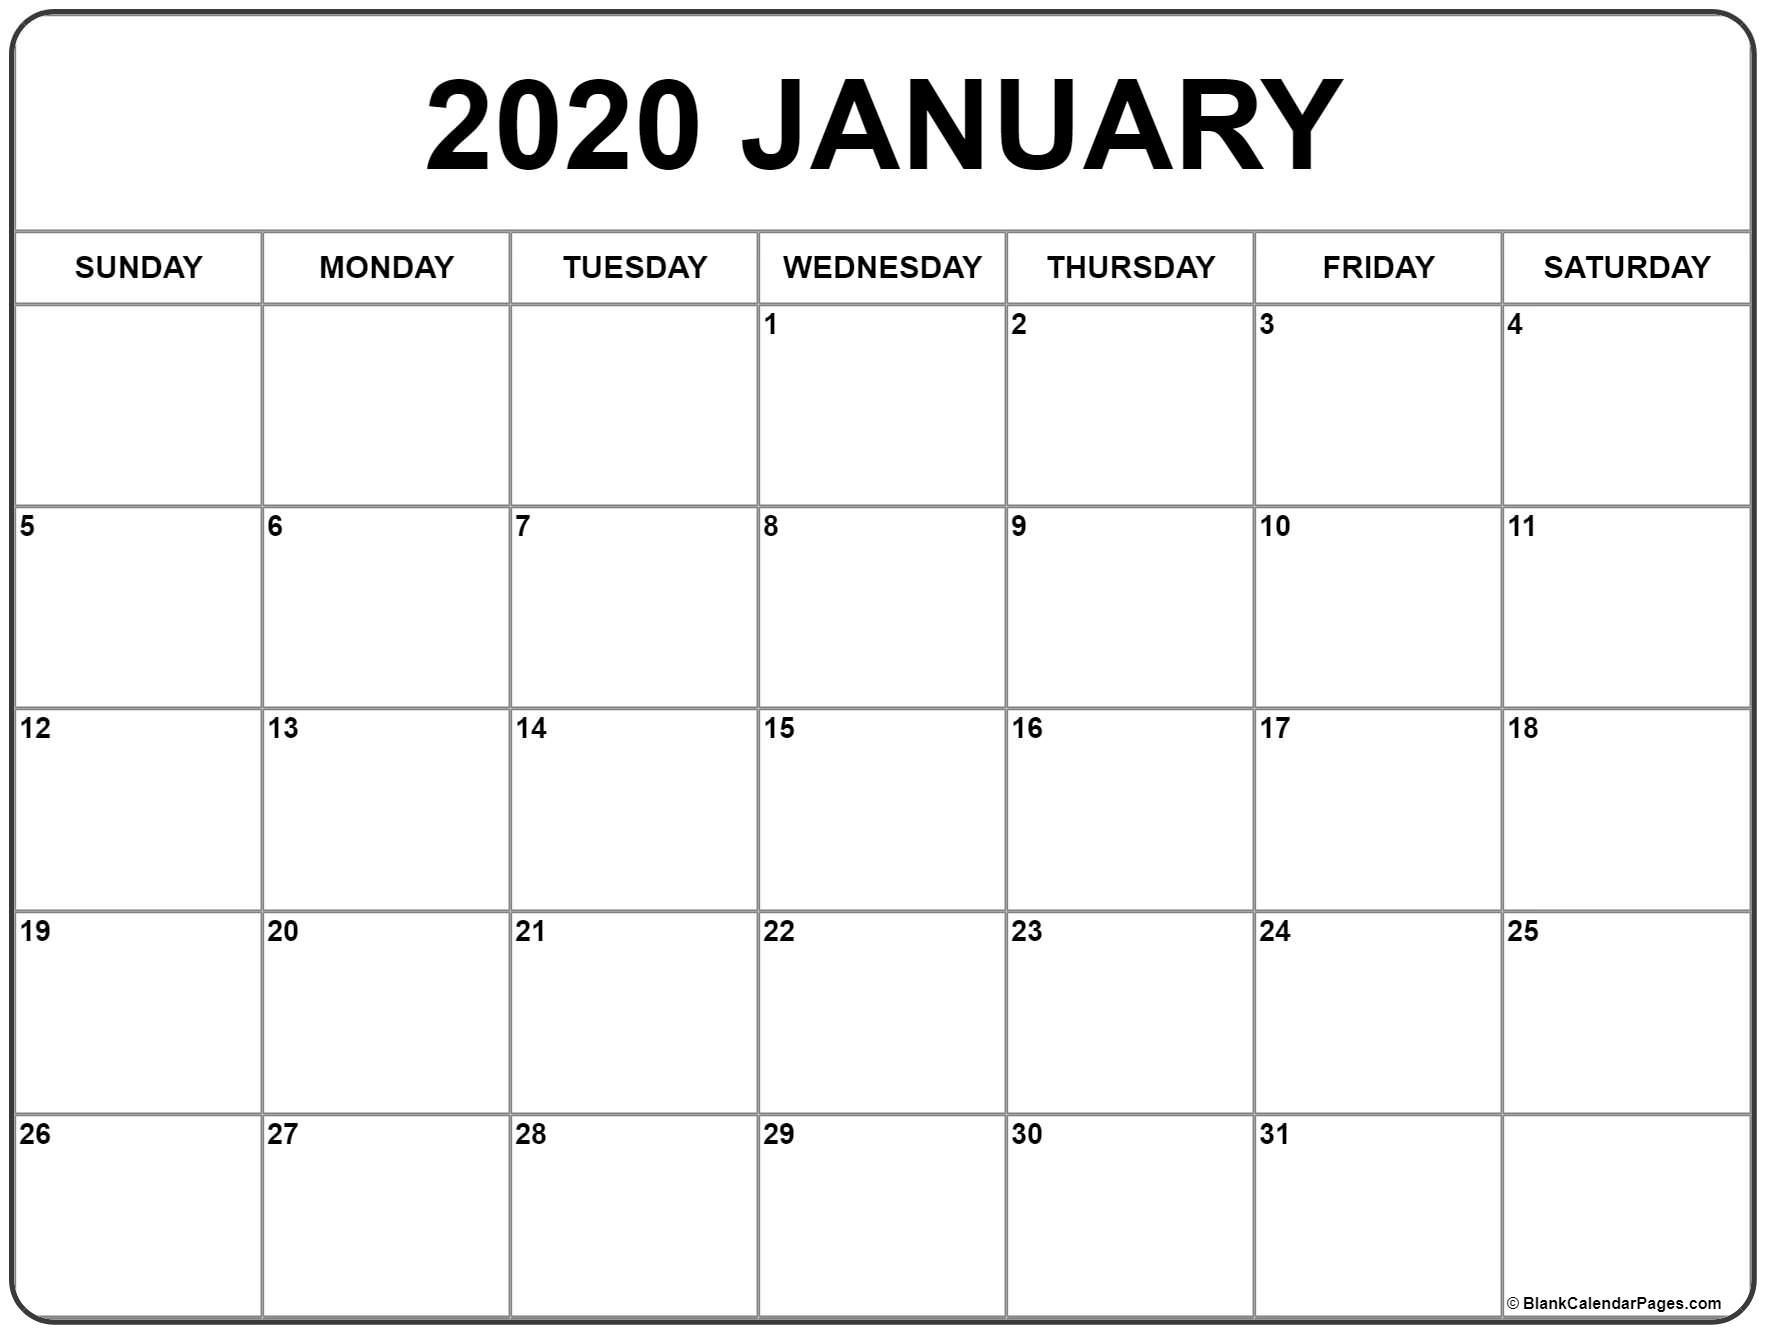 January 2020 Calendar | Free Printable Monthly Calendars-Blank January 2020 Calendar